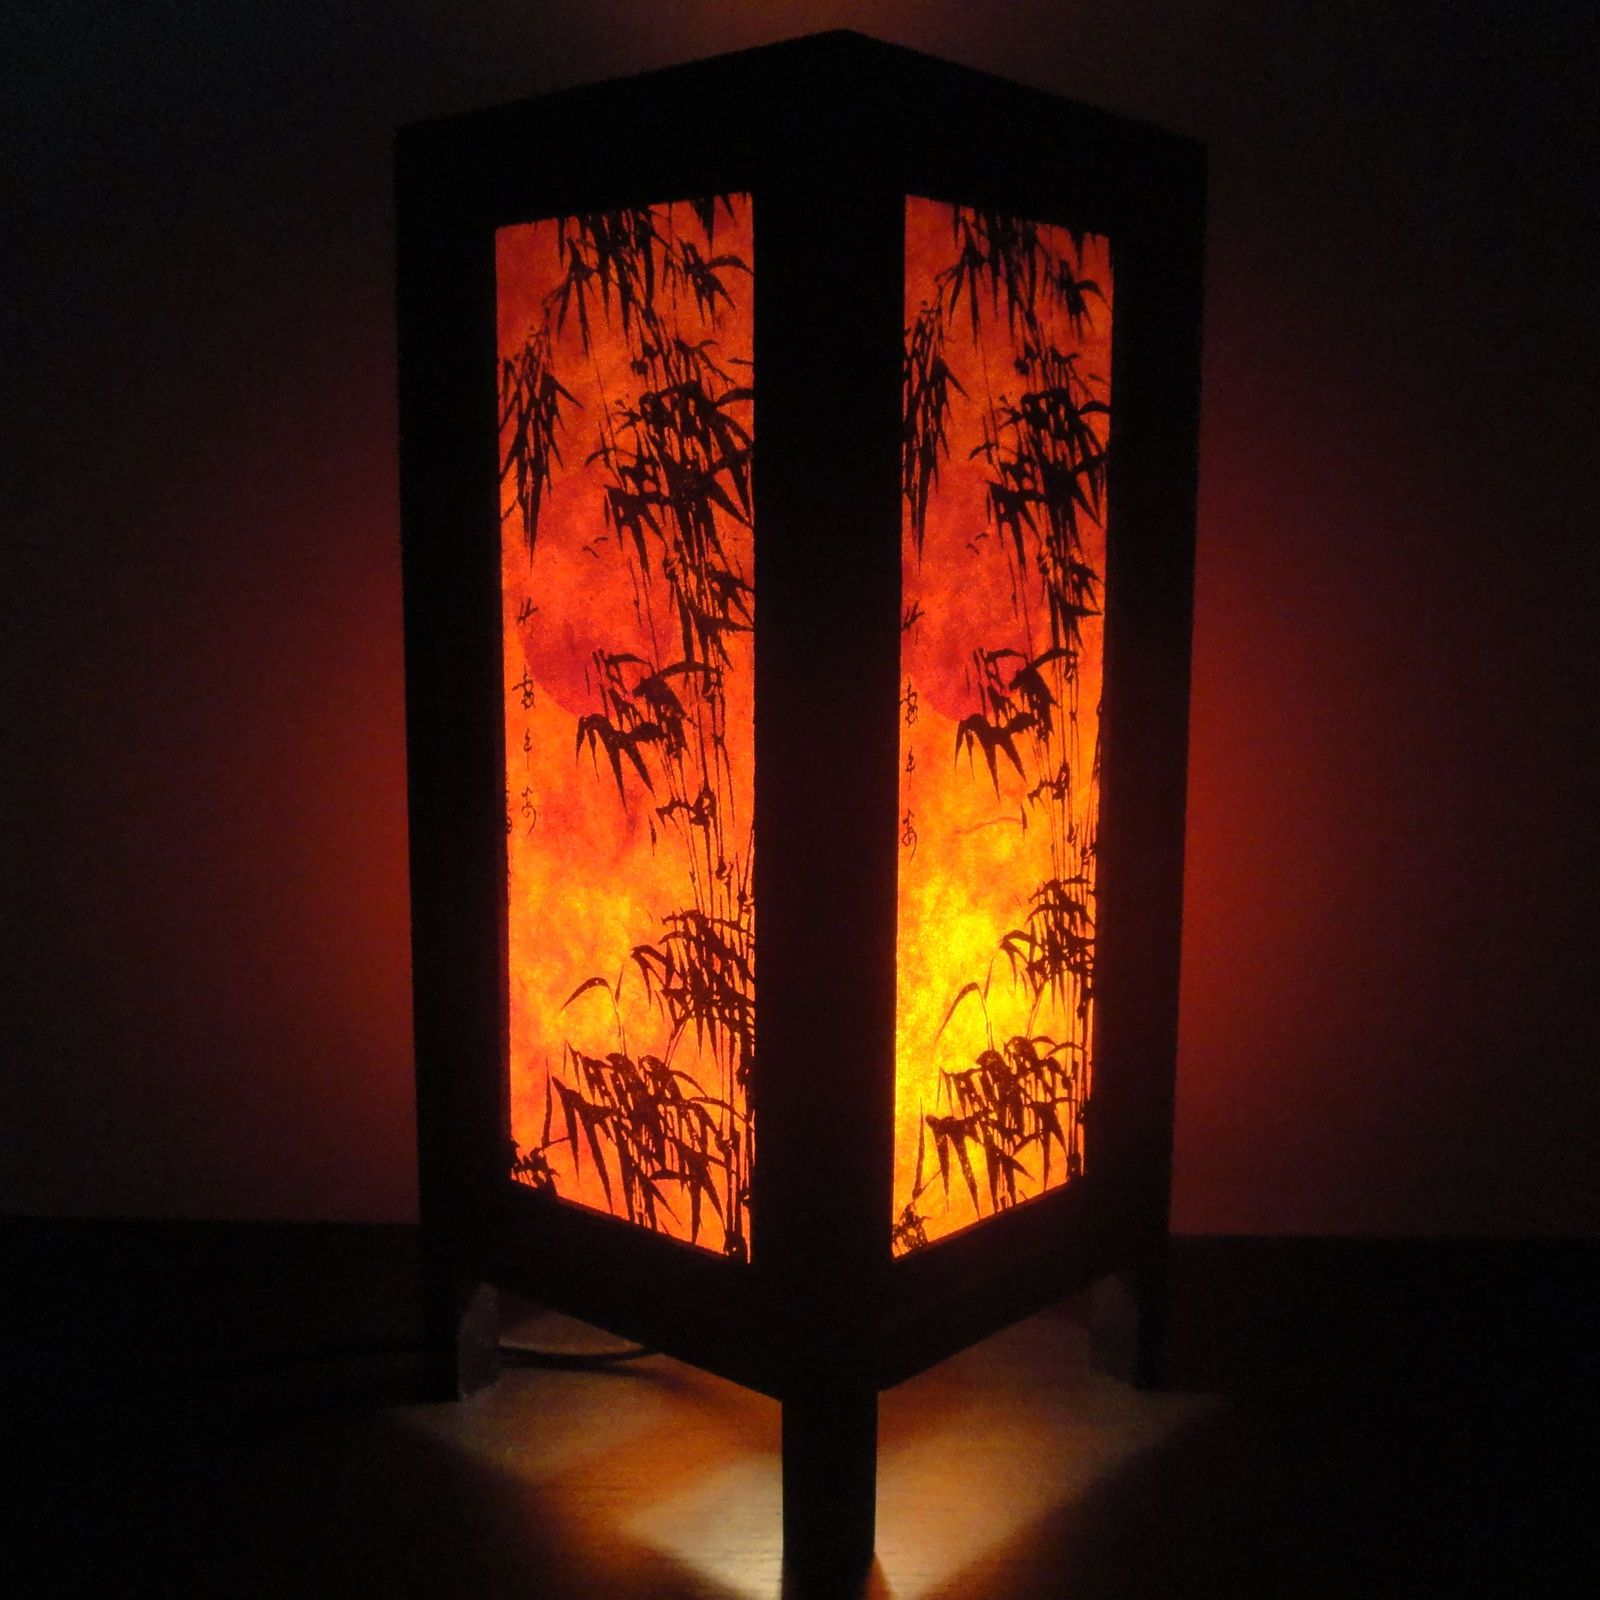 9 98 Aud Asian Oriental Dawning Sunset Japanese Art Bedside Desk Or Table Lamp Shades Ebay Home Ga Japanese Lamps Table Lamp Shades Painting Lamp Shades